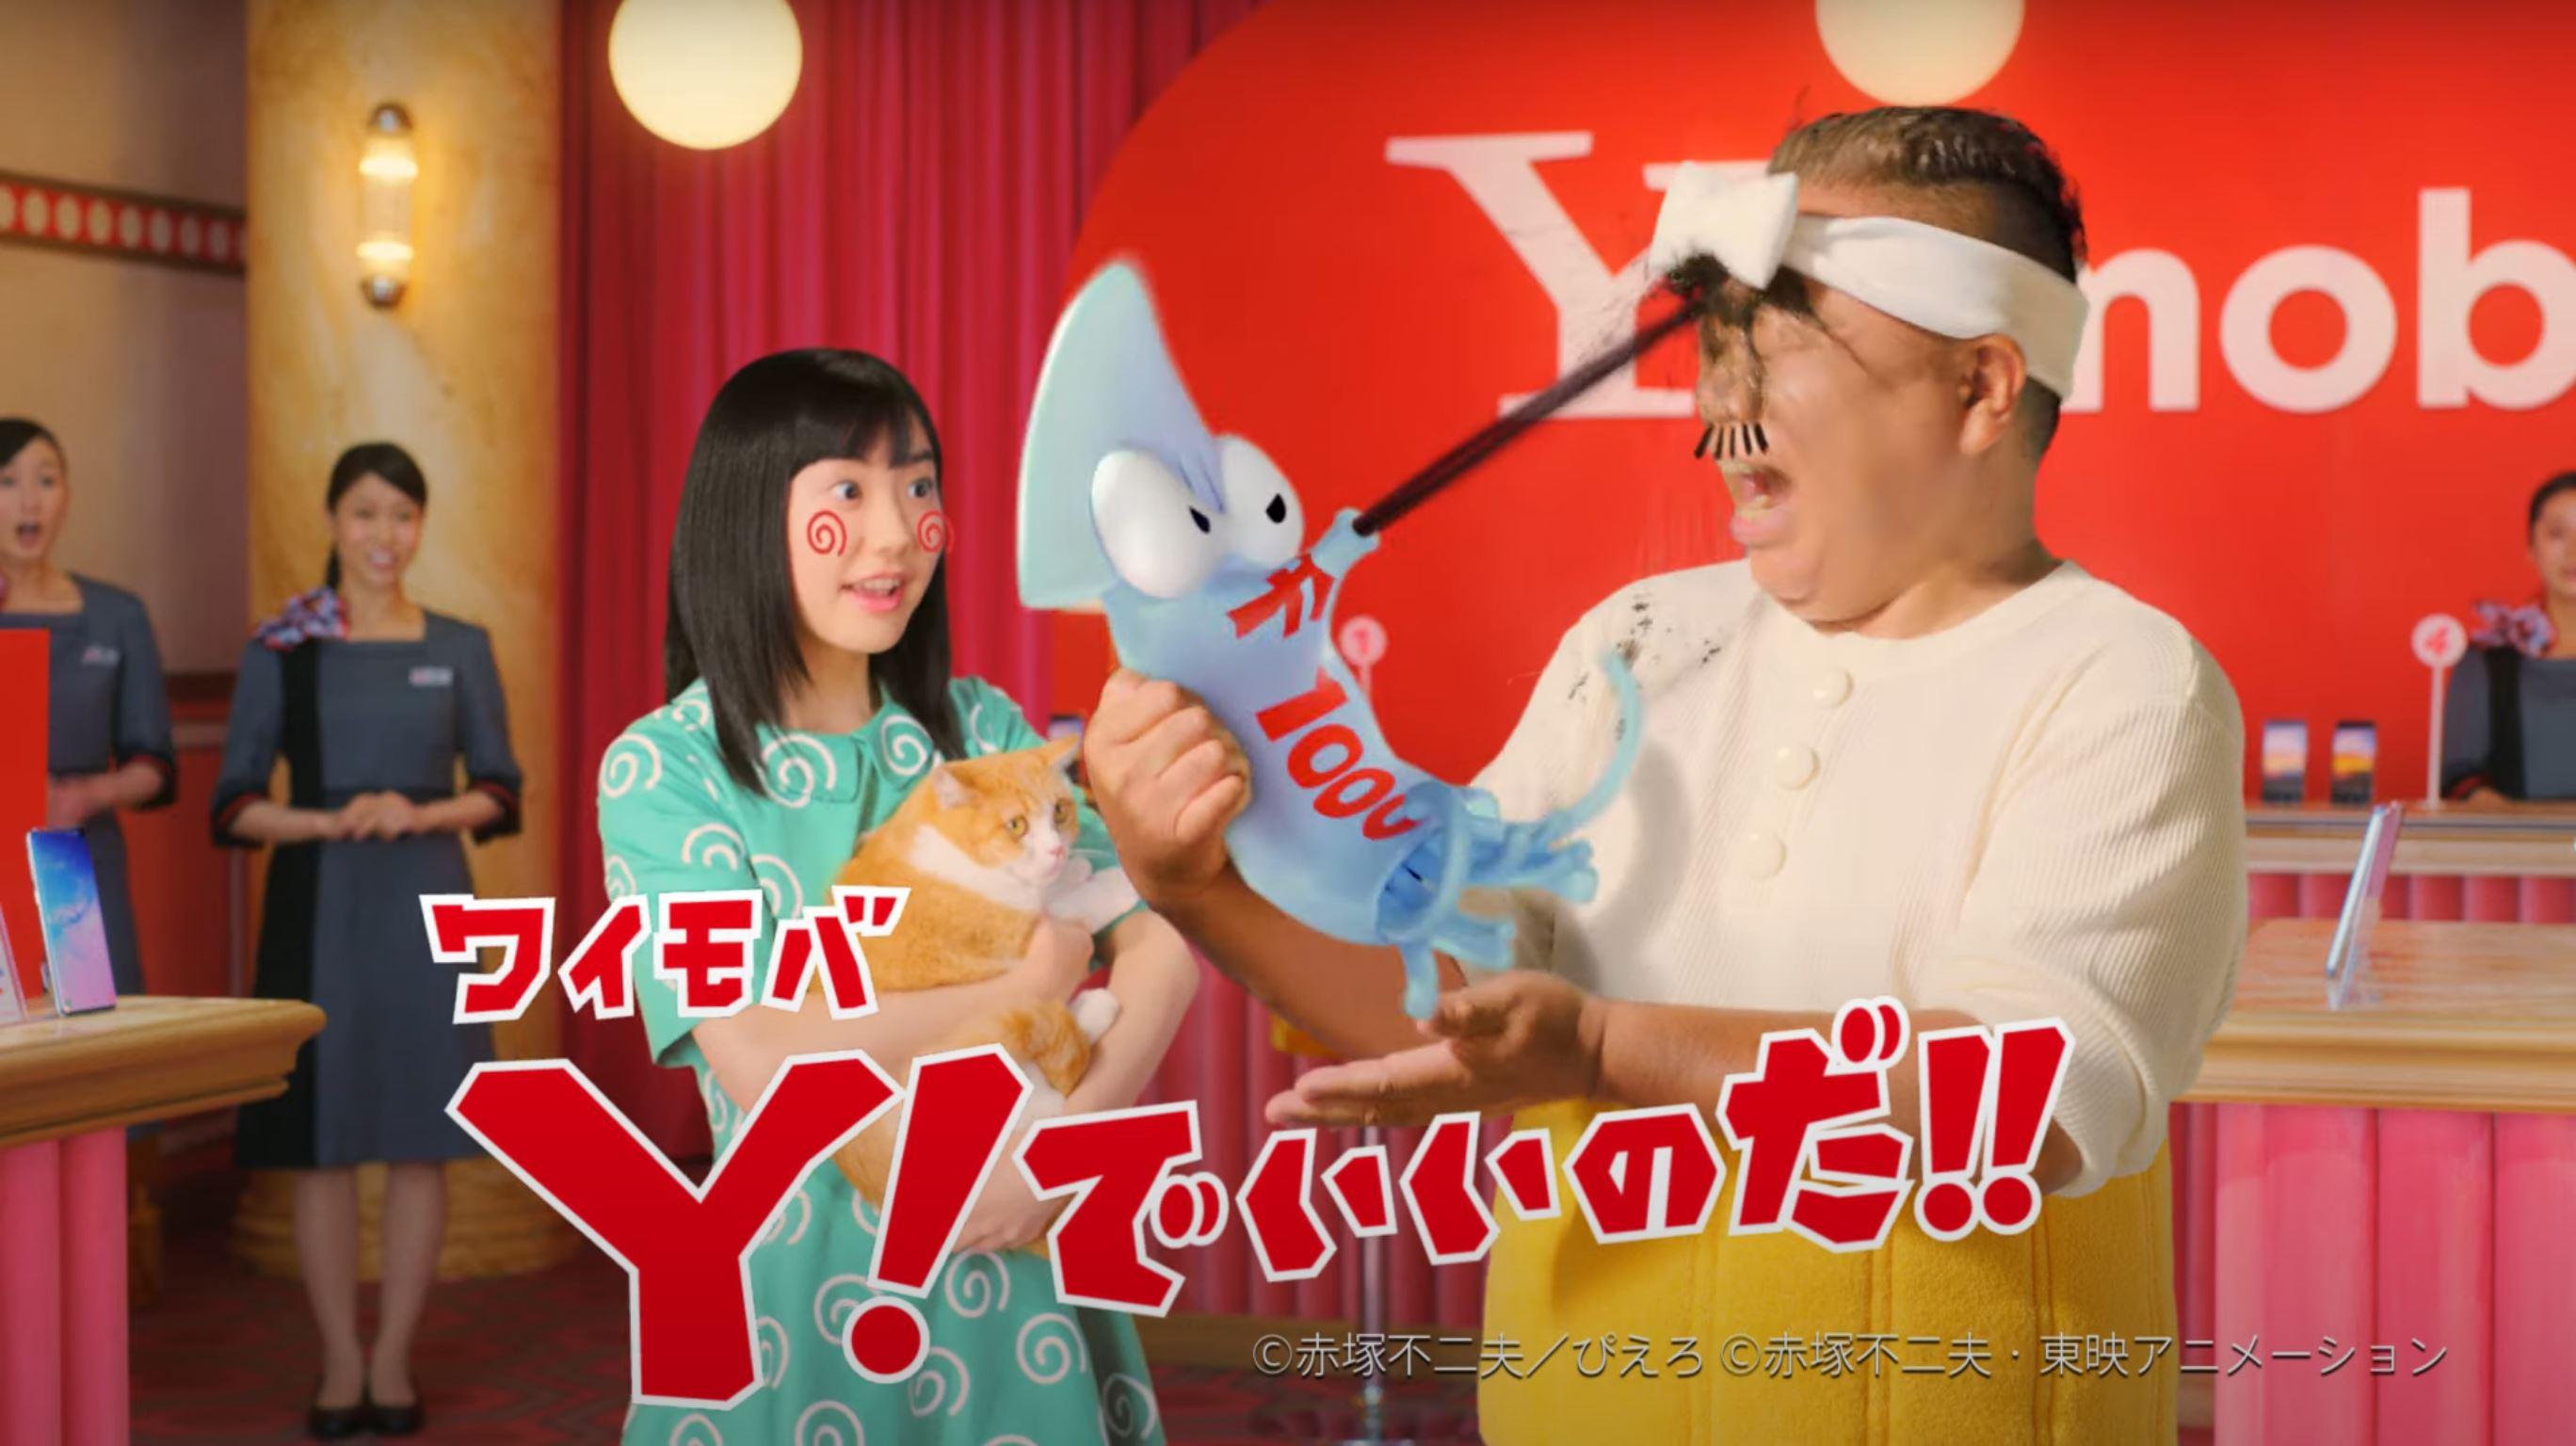 [IMAGE] 鶴薗彩_TVCM【Y!mobile】ショップ店員役で出演